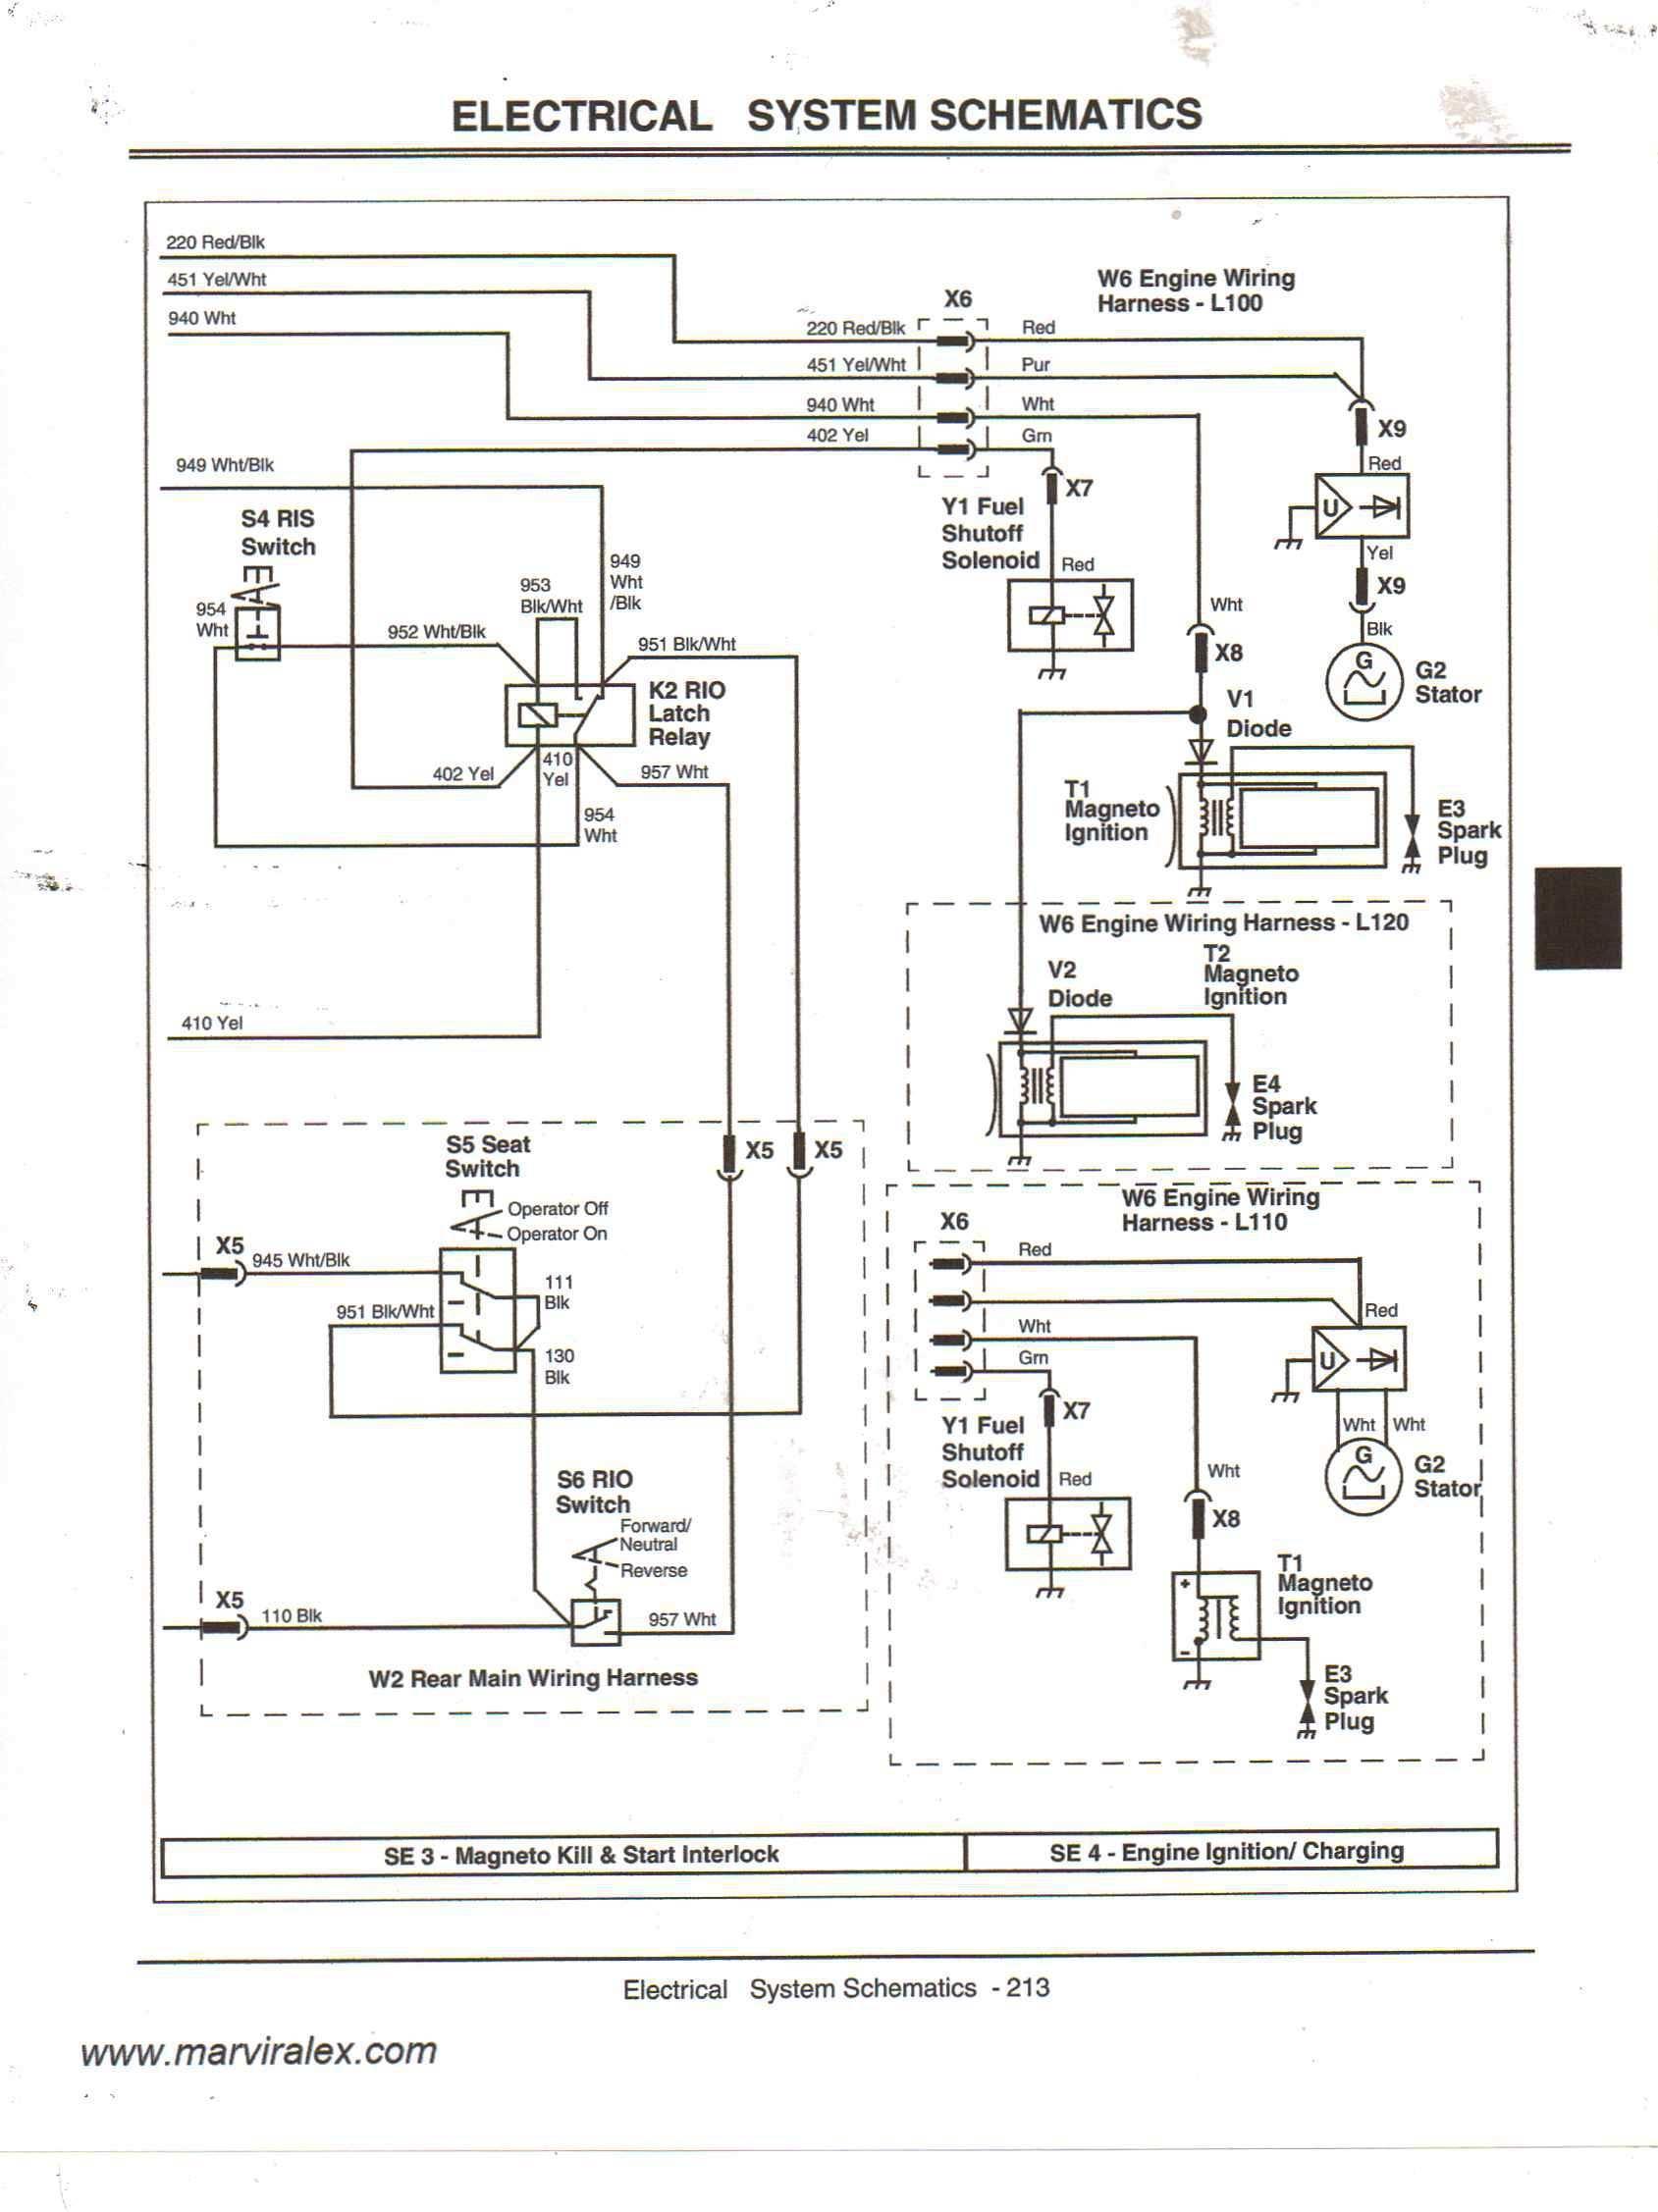 john deere 6310 wiring diagram | manual e books – john deere wiring diagram